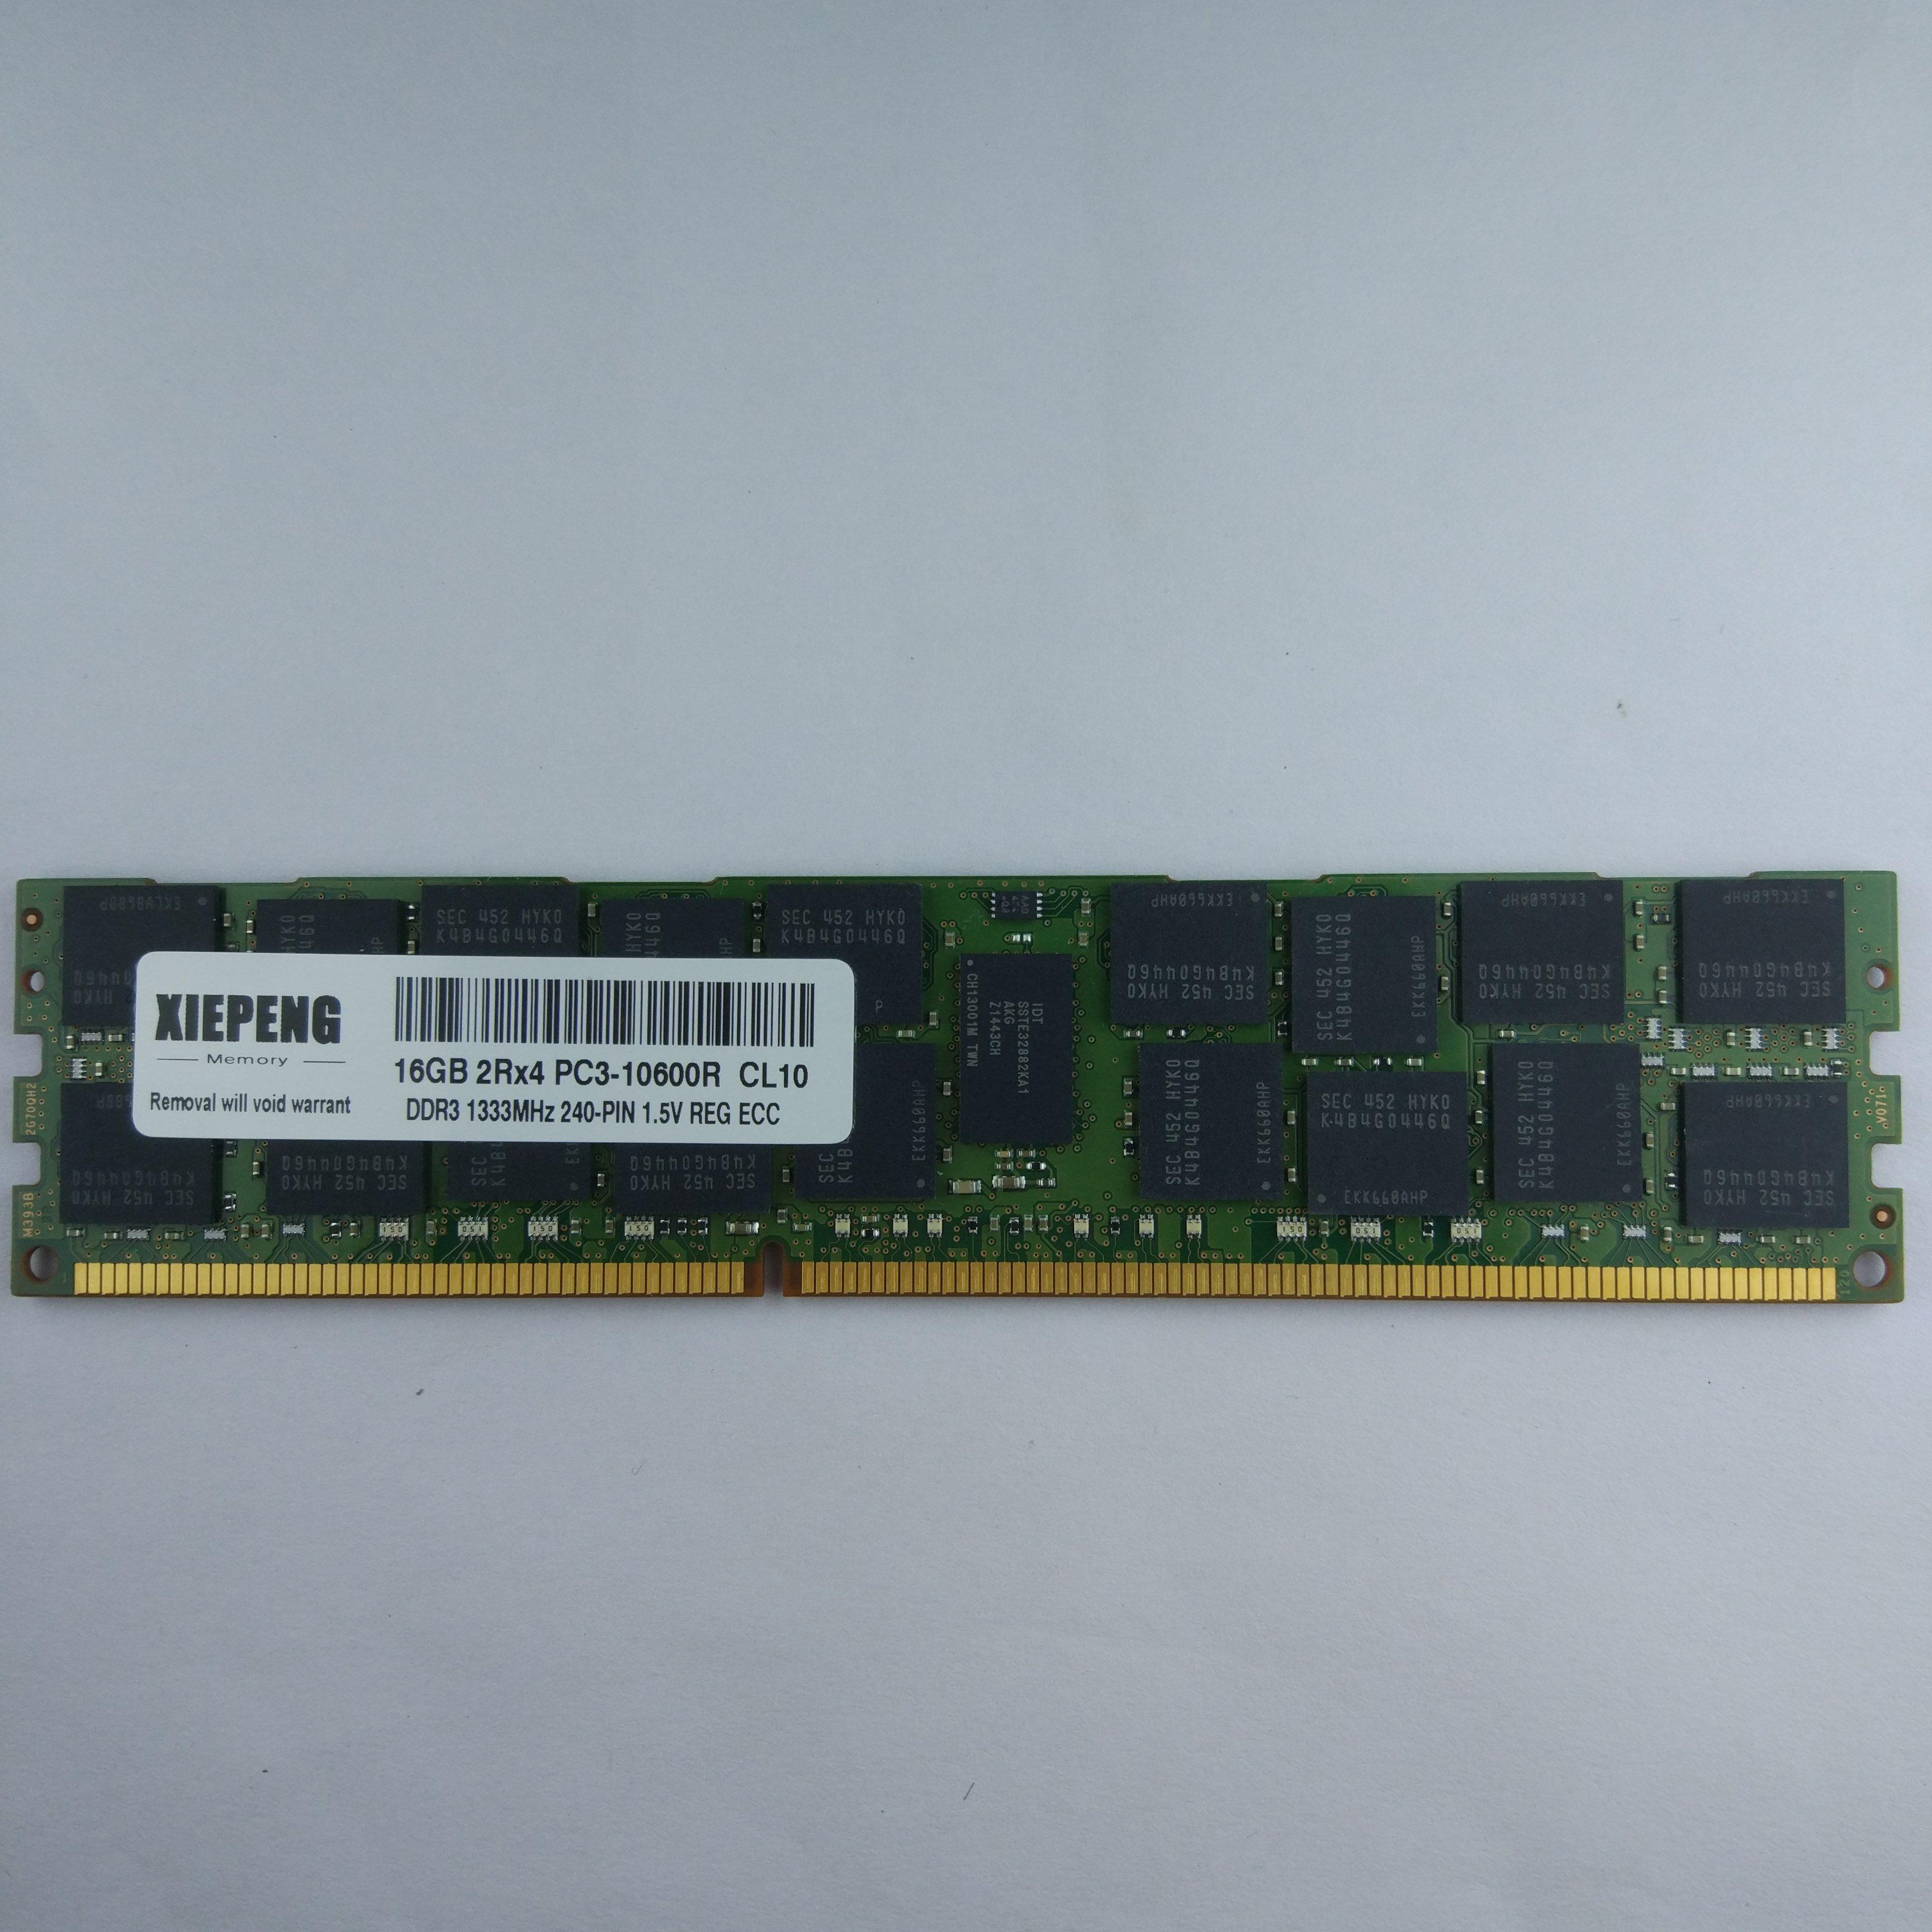 Для сервера Dell PowerEdge R520 R610 R620 R715 R720 R720xd, ОЗУ 32 ГБ, 4Rx4 PC3L-10600R REG ECC 16g DDR3 1333 МГц 8G